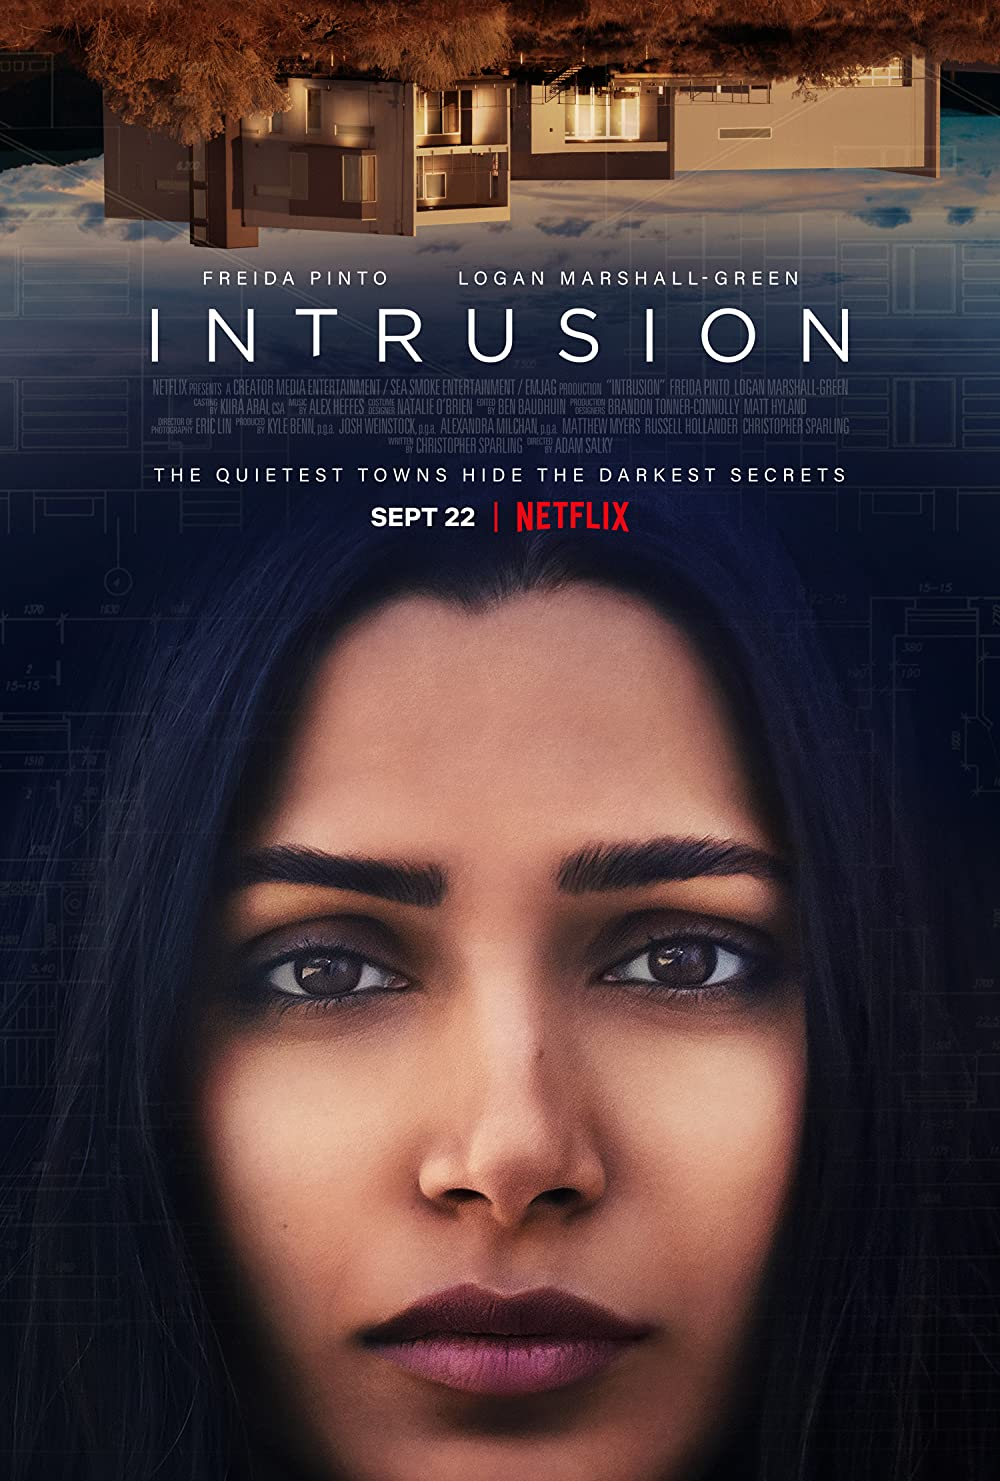 Intrusion (2021) Hindi ORG Dual Audio 300MB NF HDRip 480p ESubs Free Download